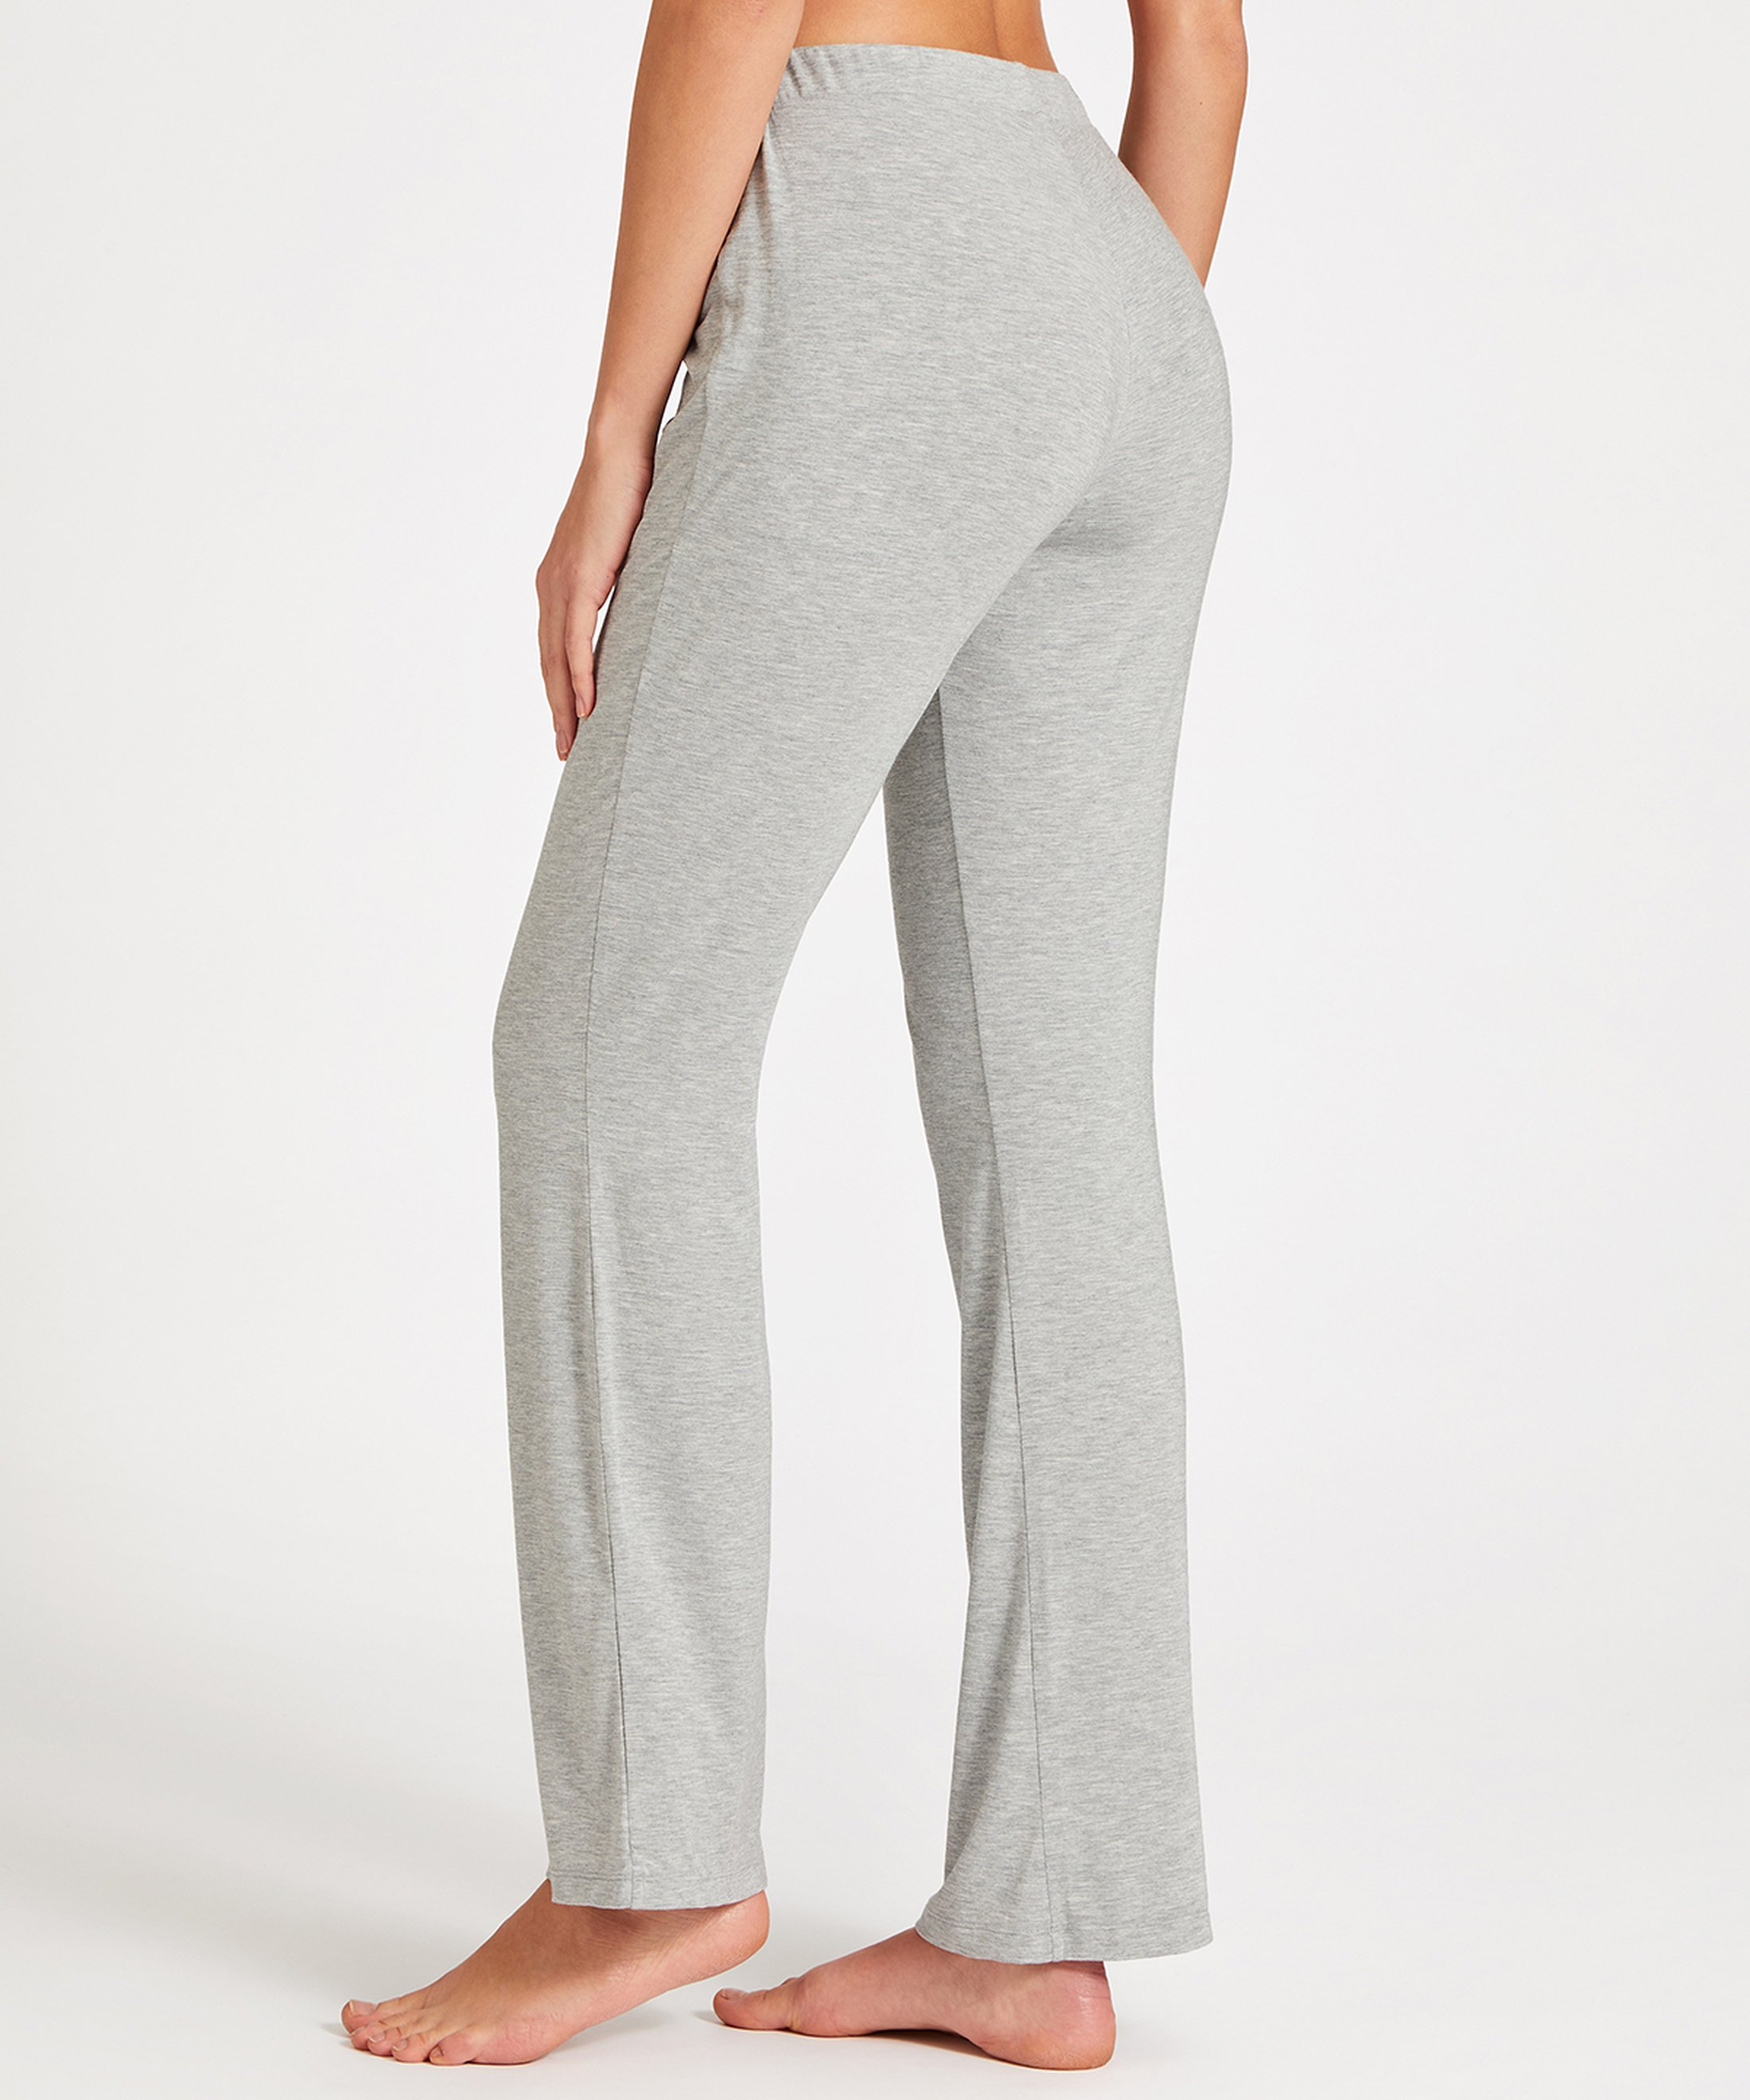 SWEET BLISS Pantalon en modal Gris Graphite   Aubade